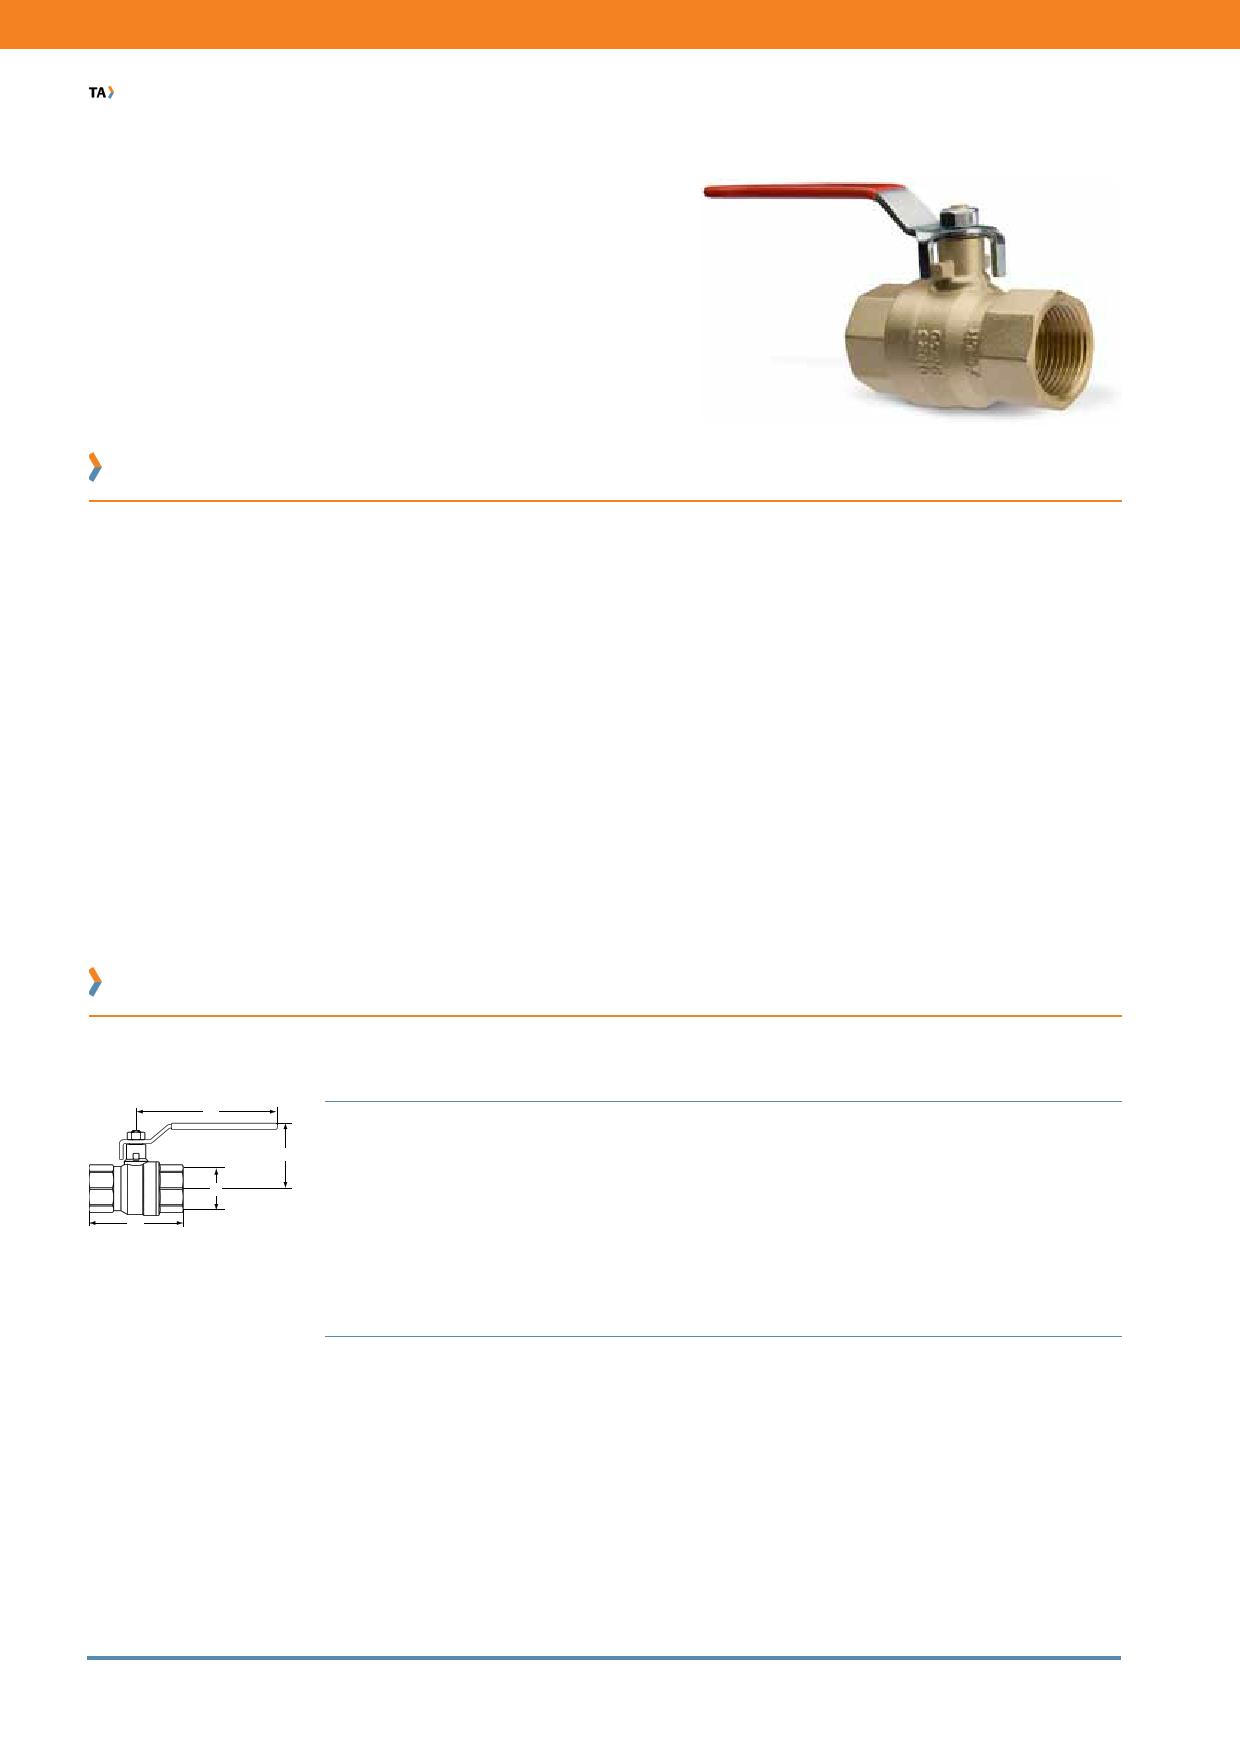 BAV86 pdf, schematic